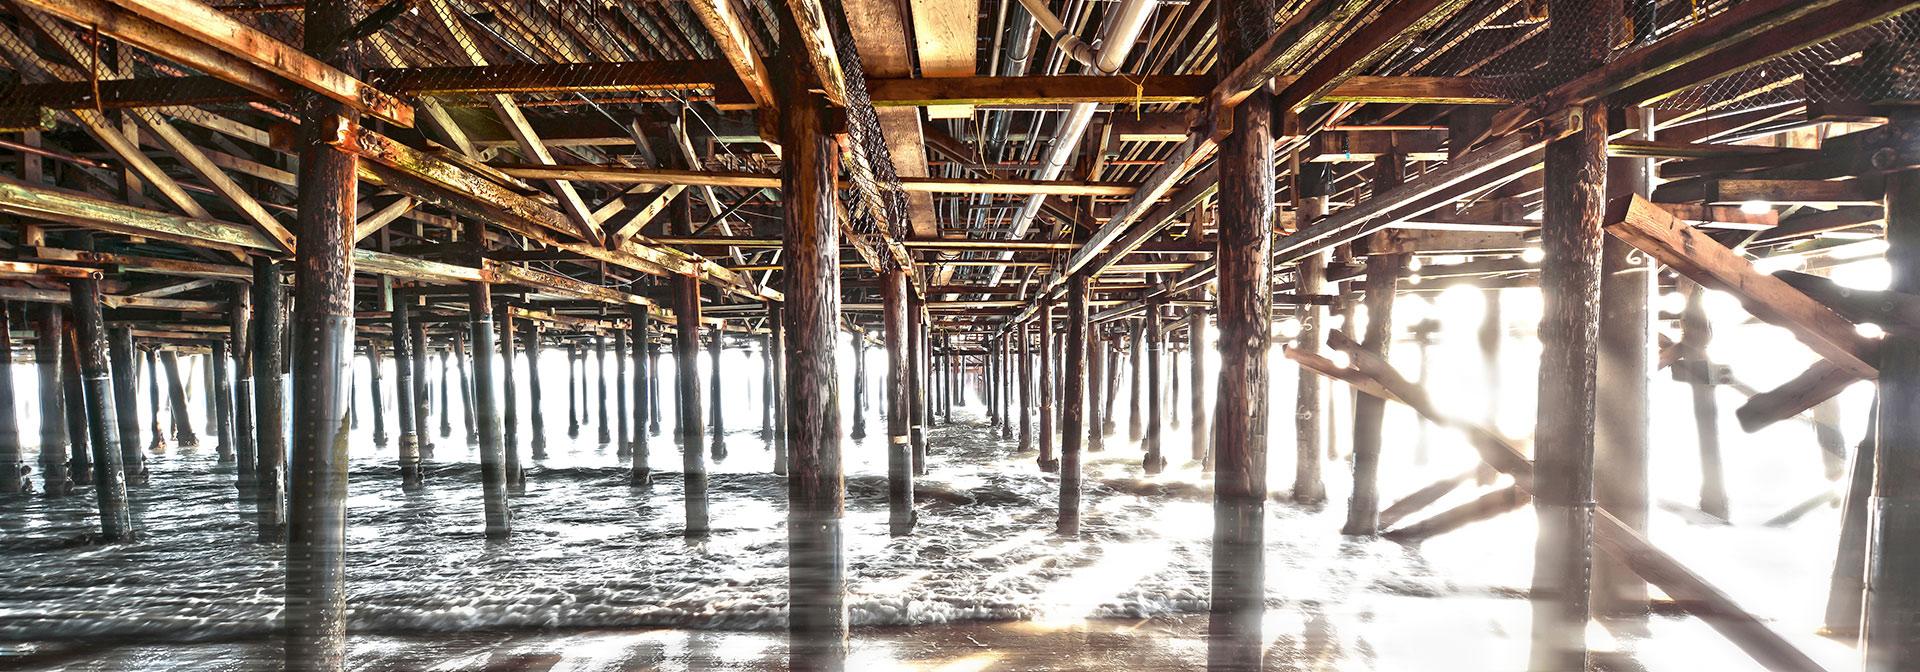 Under the Pier Santa Monica